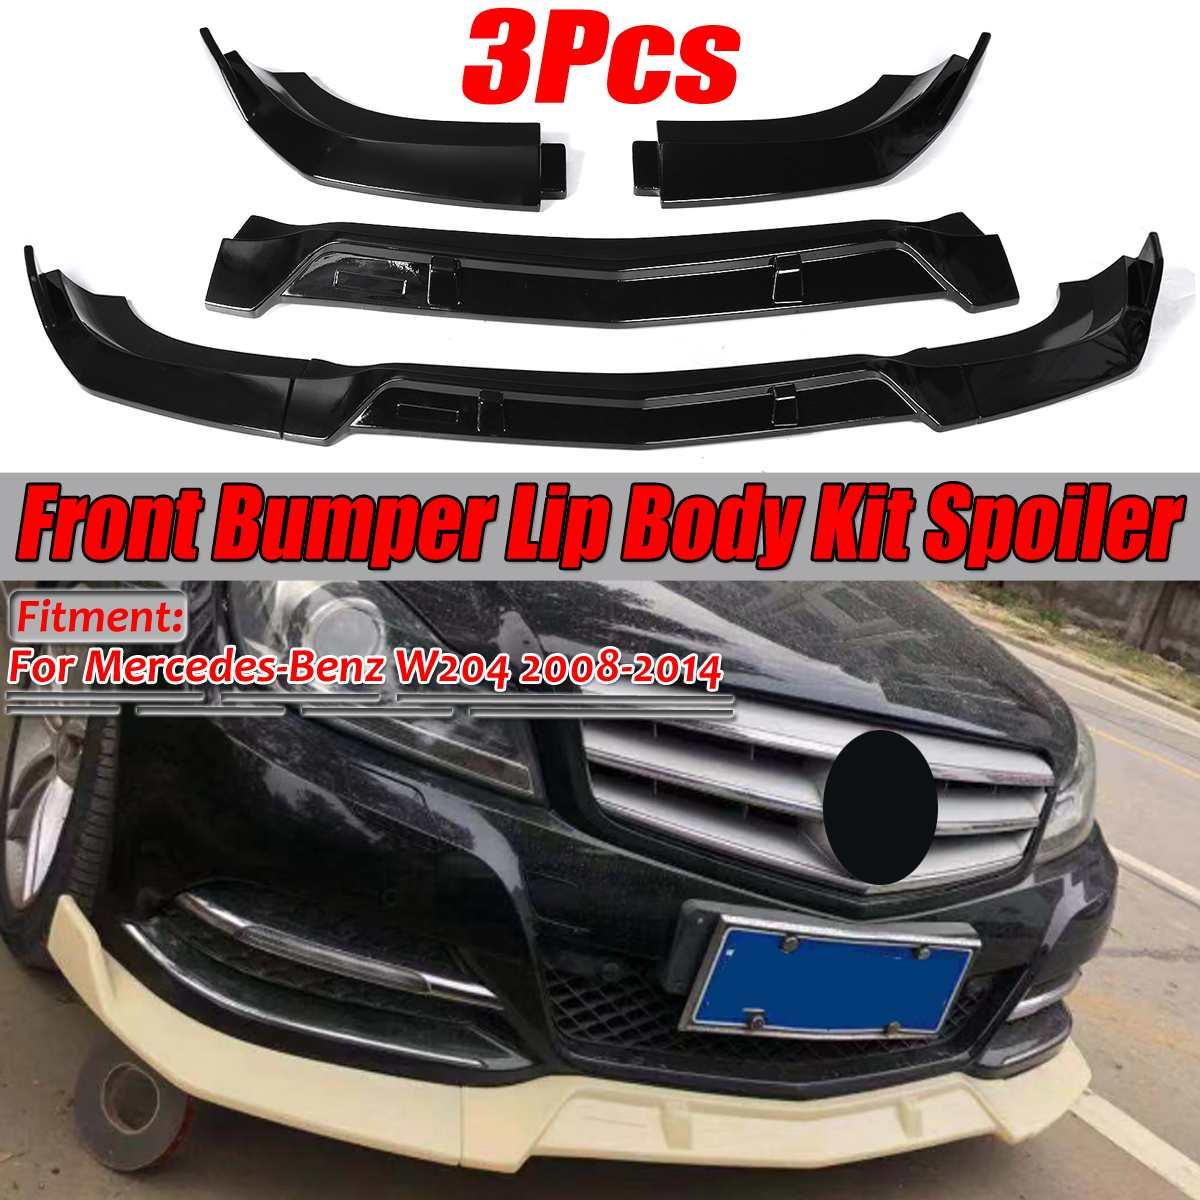 08-11 Mercedes-Benz W204 C300 C350 Sedan Carbon Fiber Godhand Style Front Lip